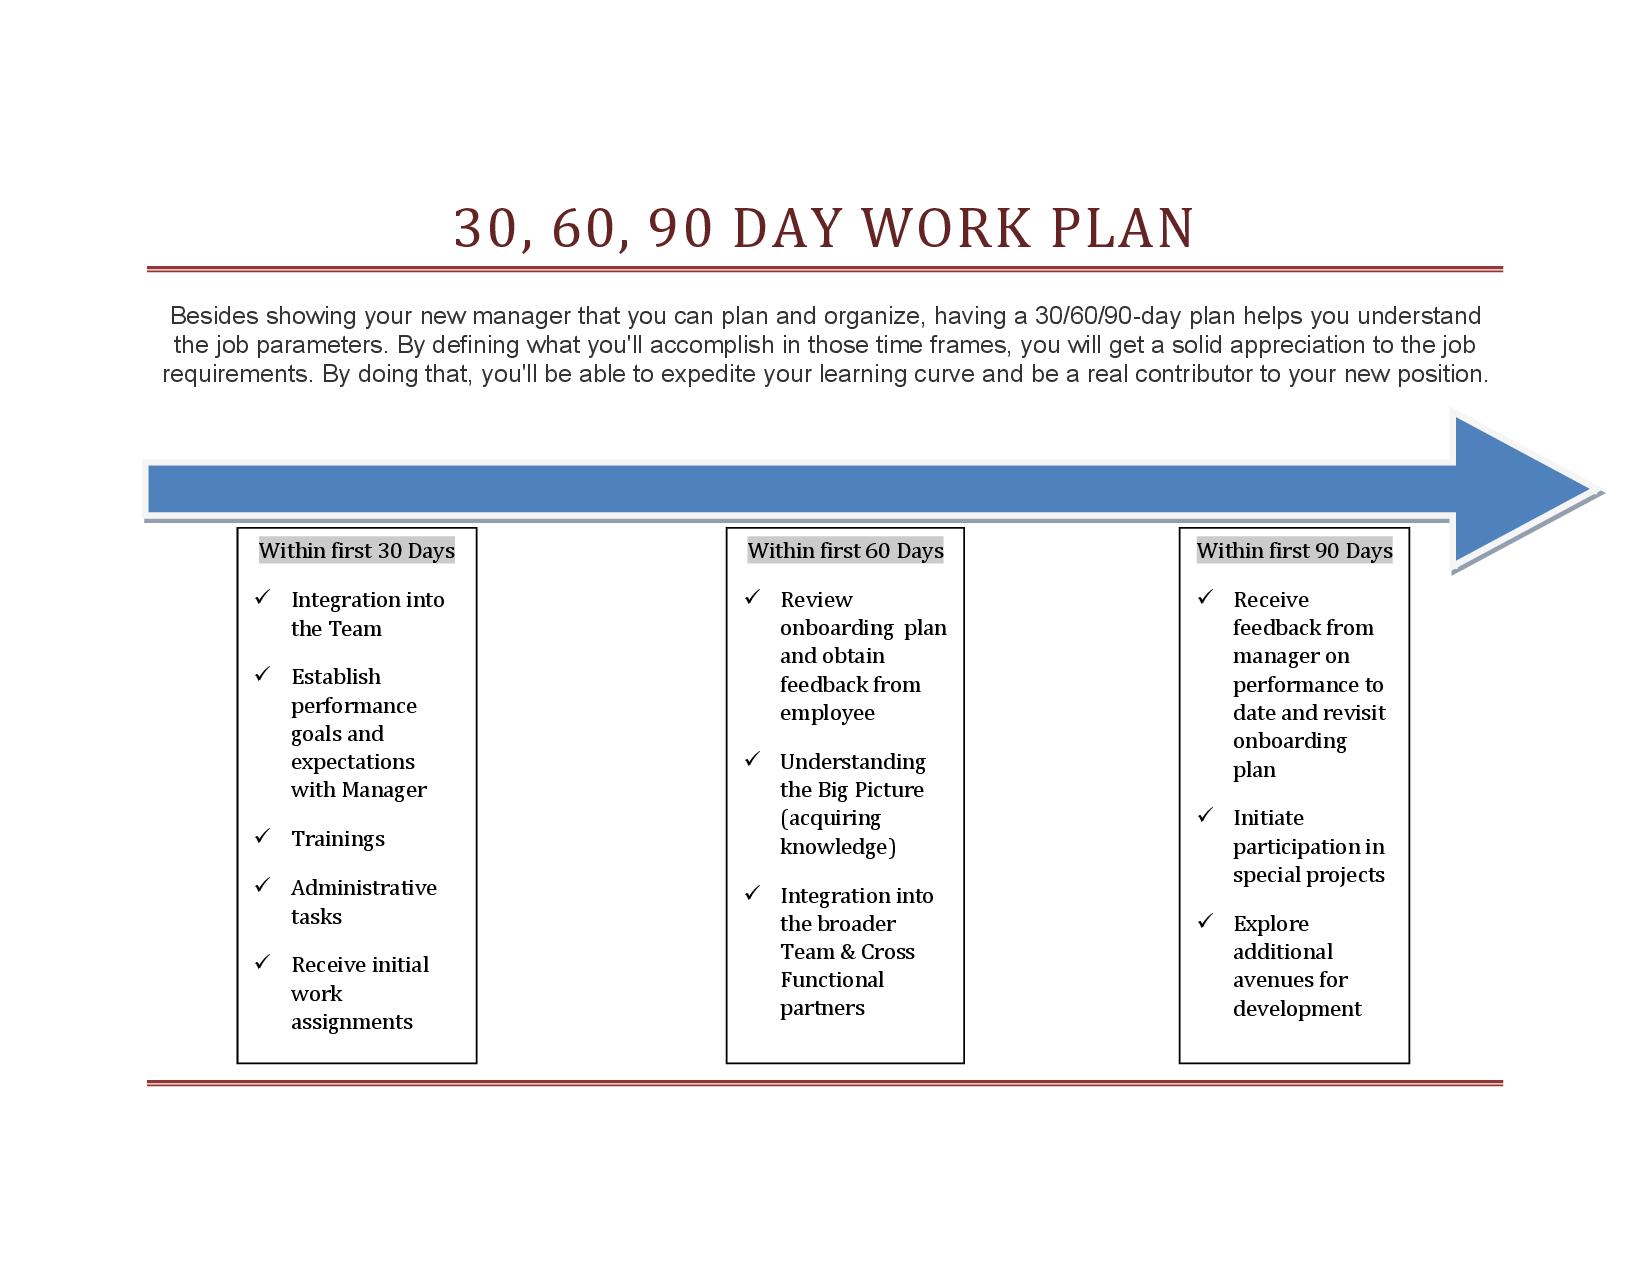 30_ 60_ 90 day work plan templatepdf by Tinammckenna 2pJriXvT | my ...